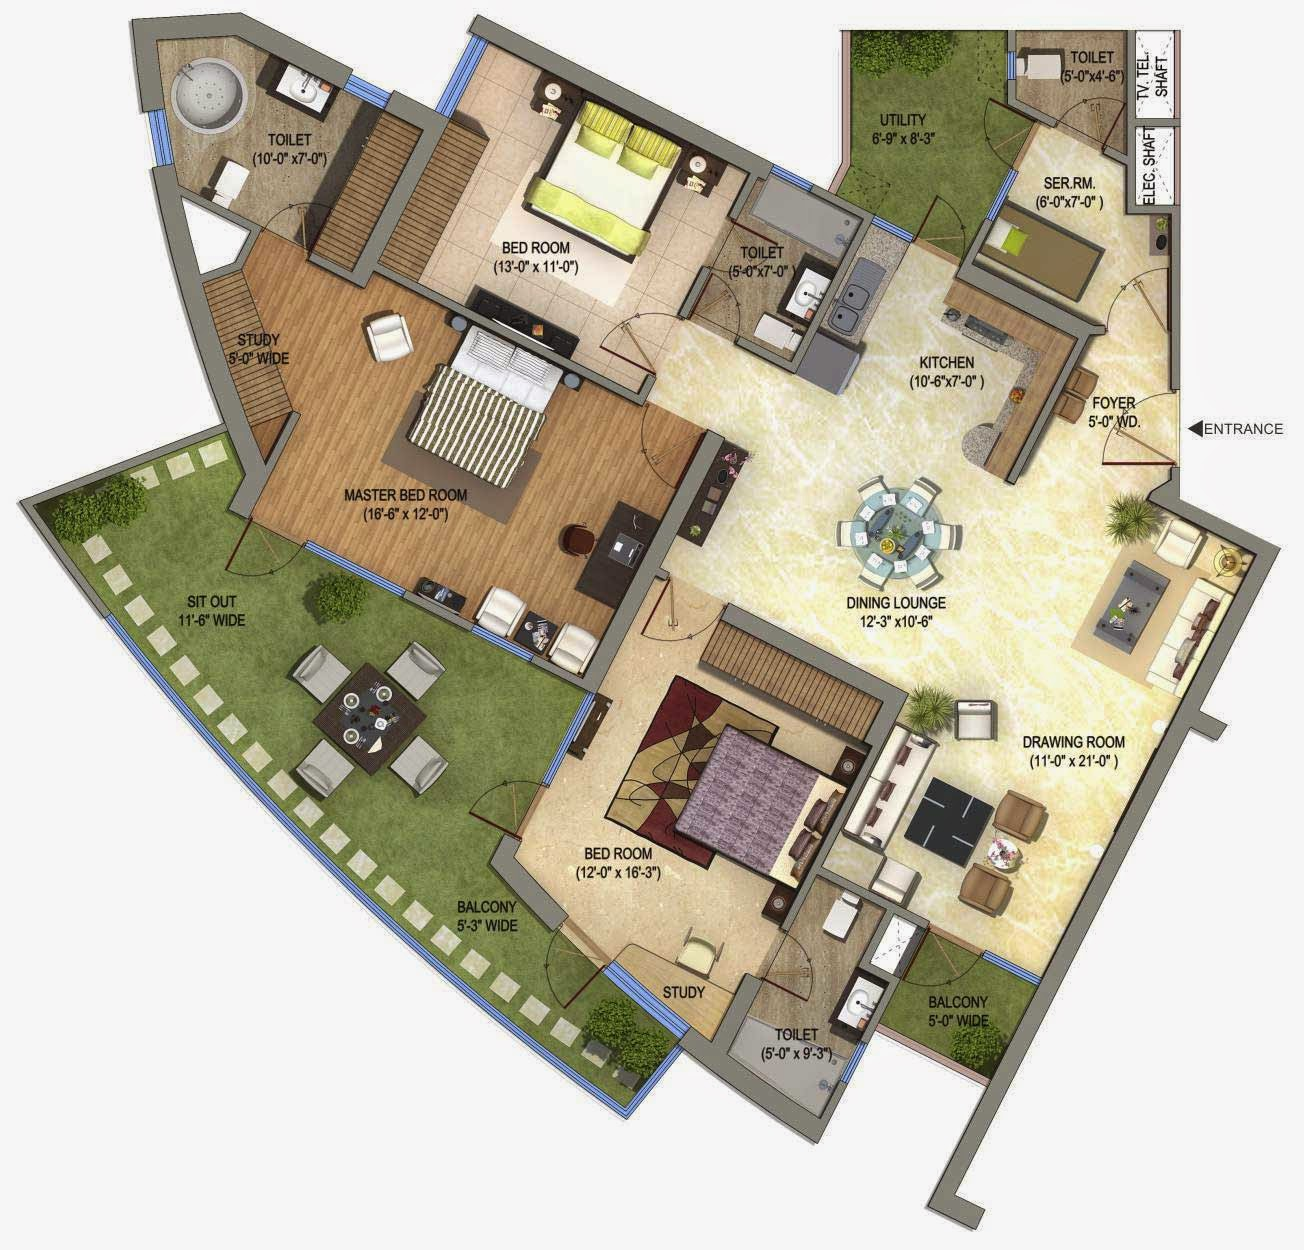 Supertech ORB: Floor Plan